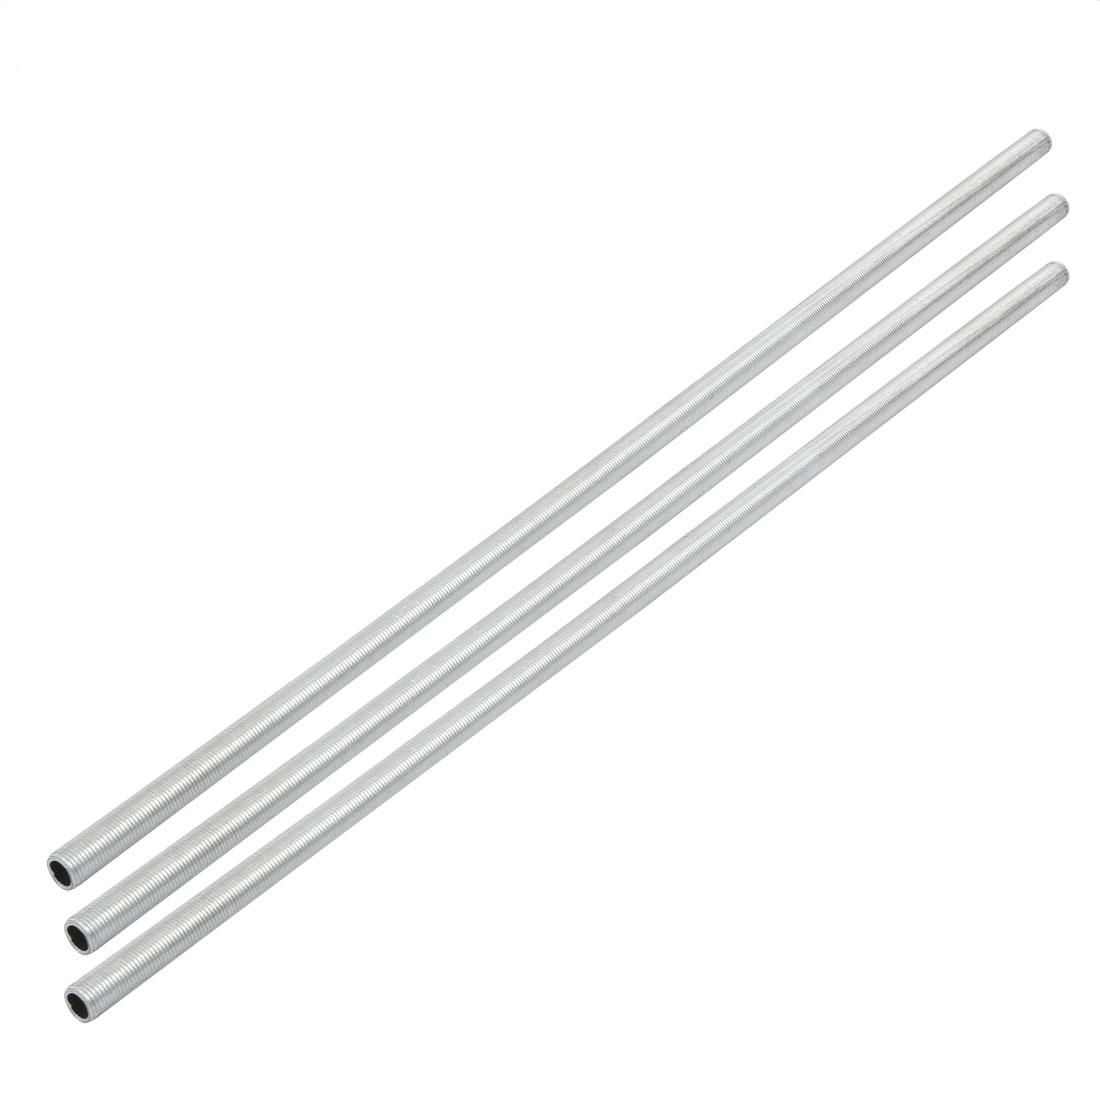 3pcs Metric M10 1mm Pitch Thread Zinc Plated Pipe Nipple Lamp Parts 46cm Long